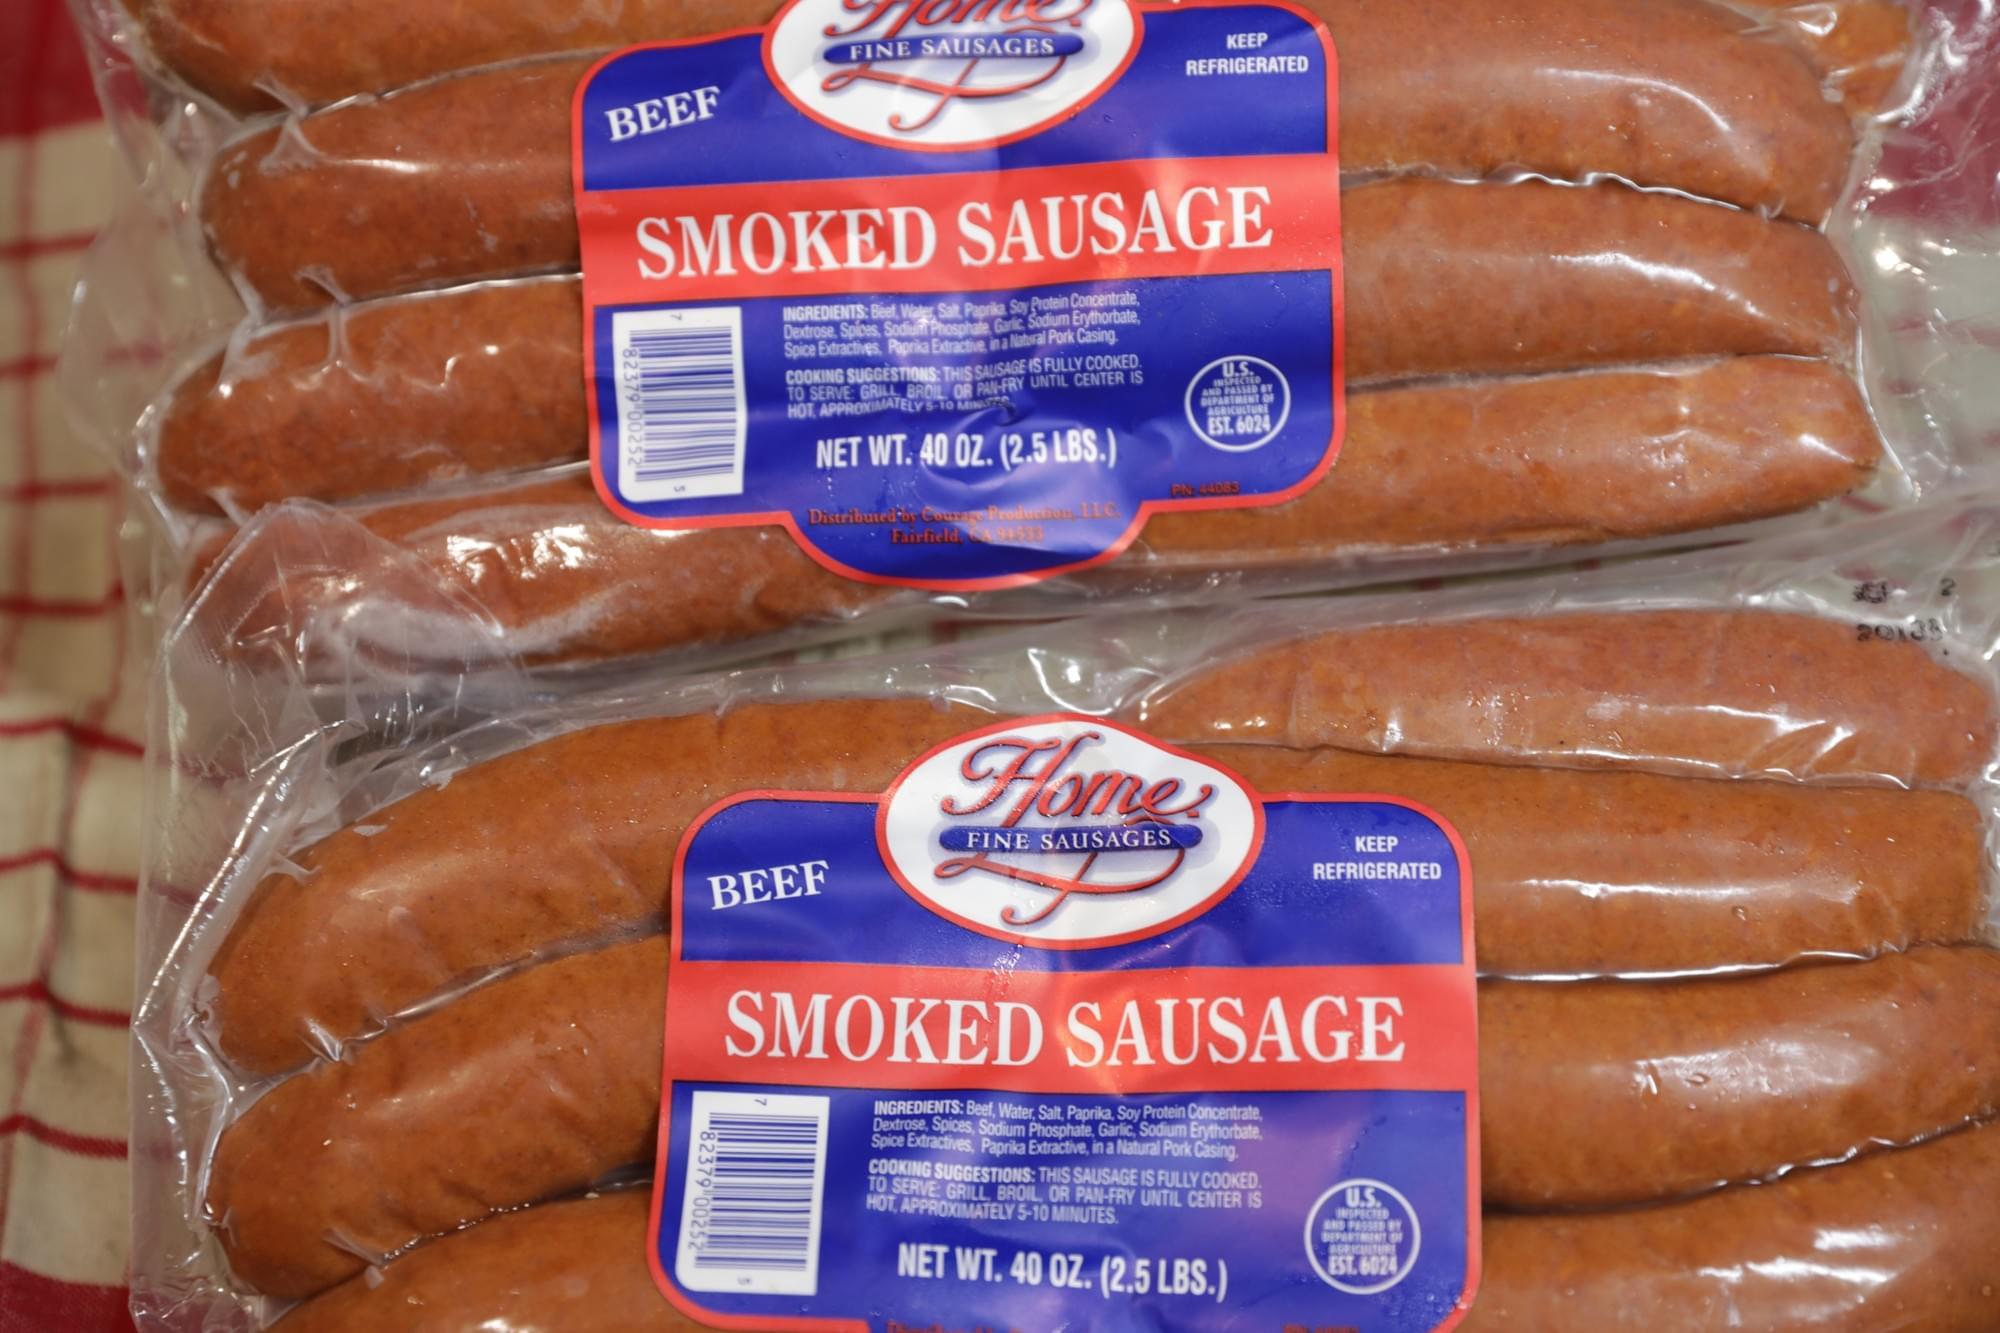 Home Beef Mild Smoked Sausage